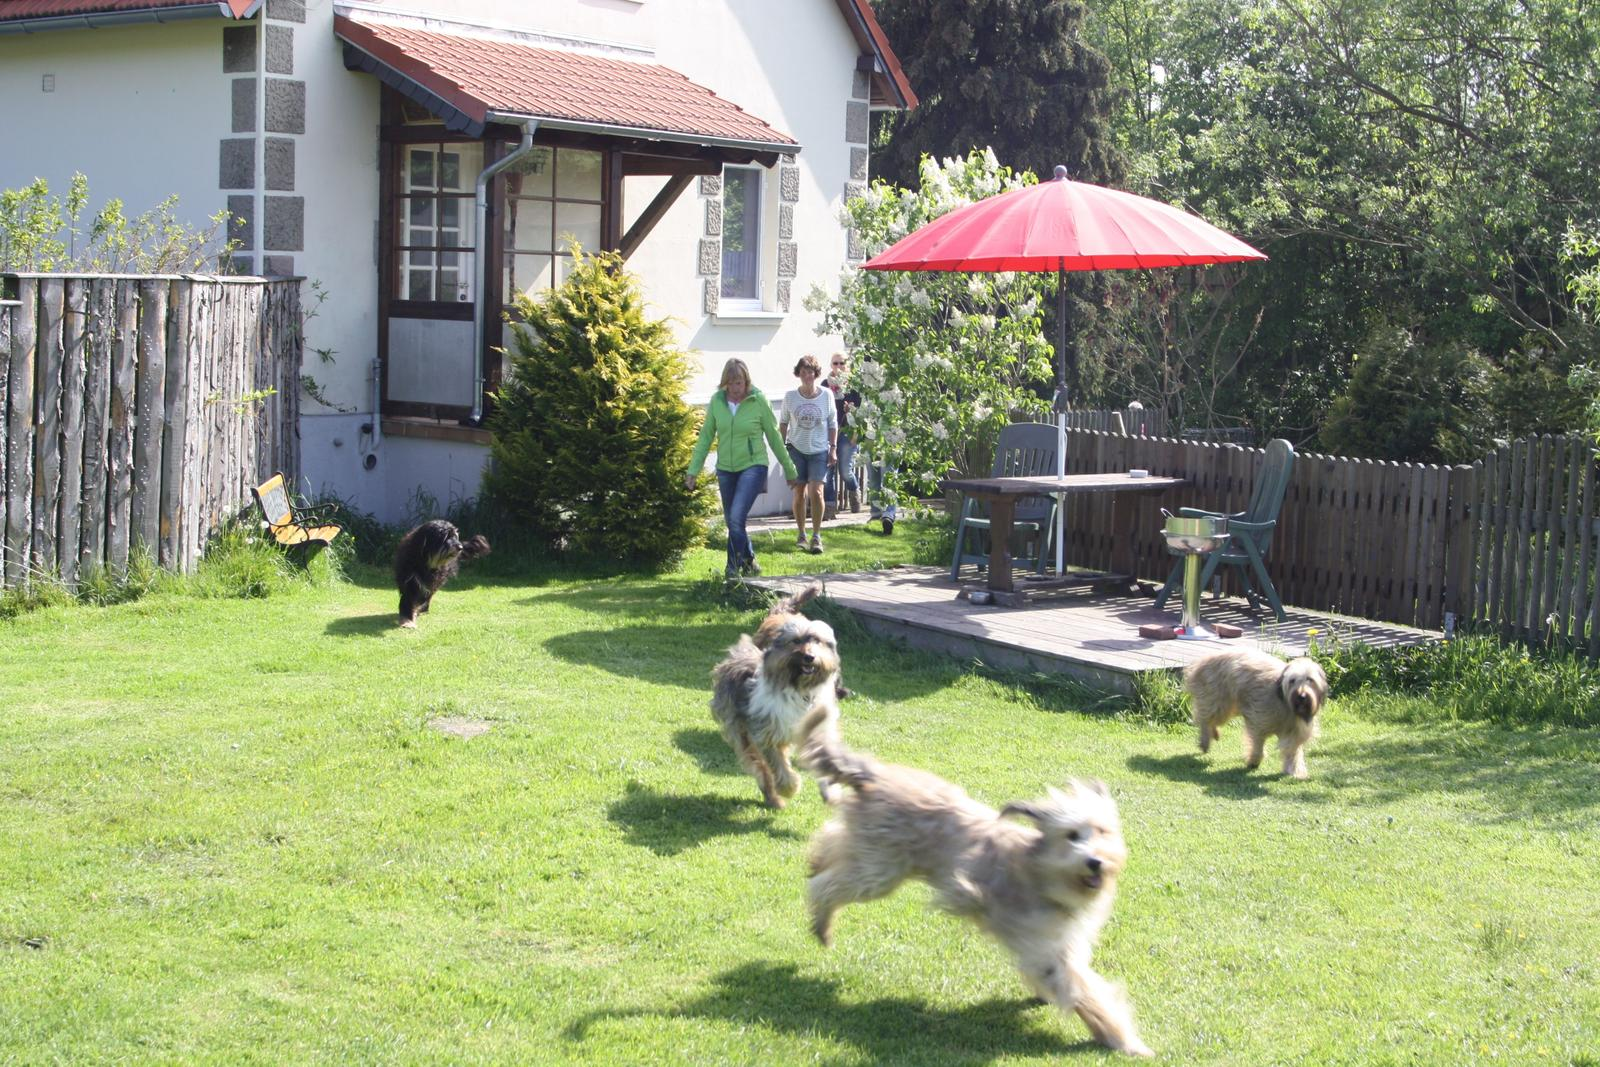 0247-02 Ferienhäuser Rieger Hunde im Garten